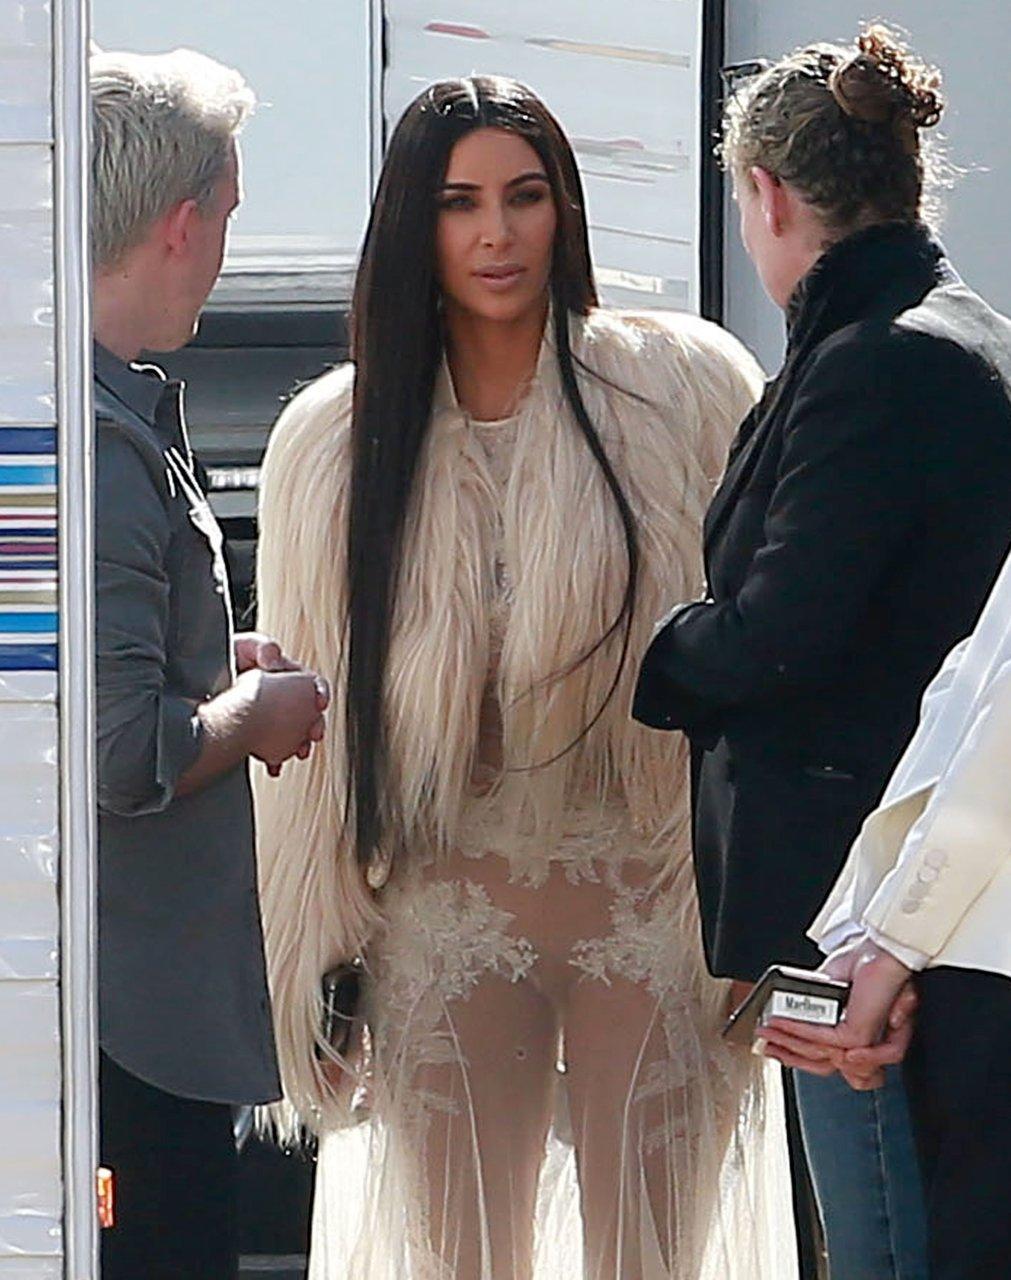 Kim kardashian shows her pussy pic, pissing in skirt tube